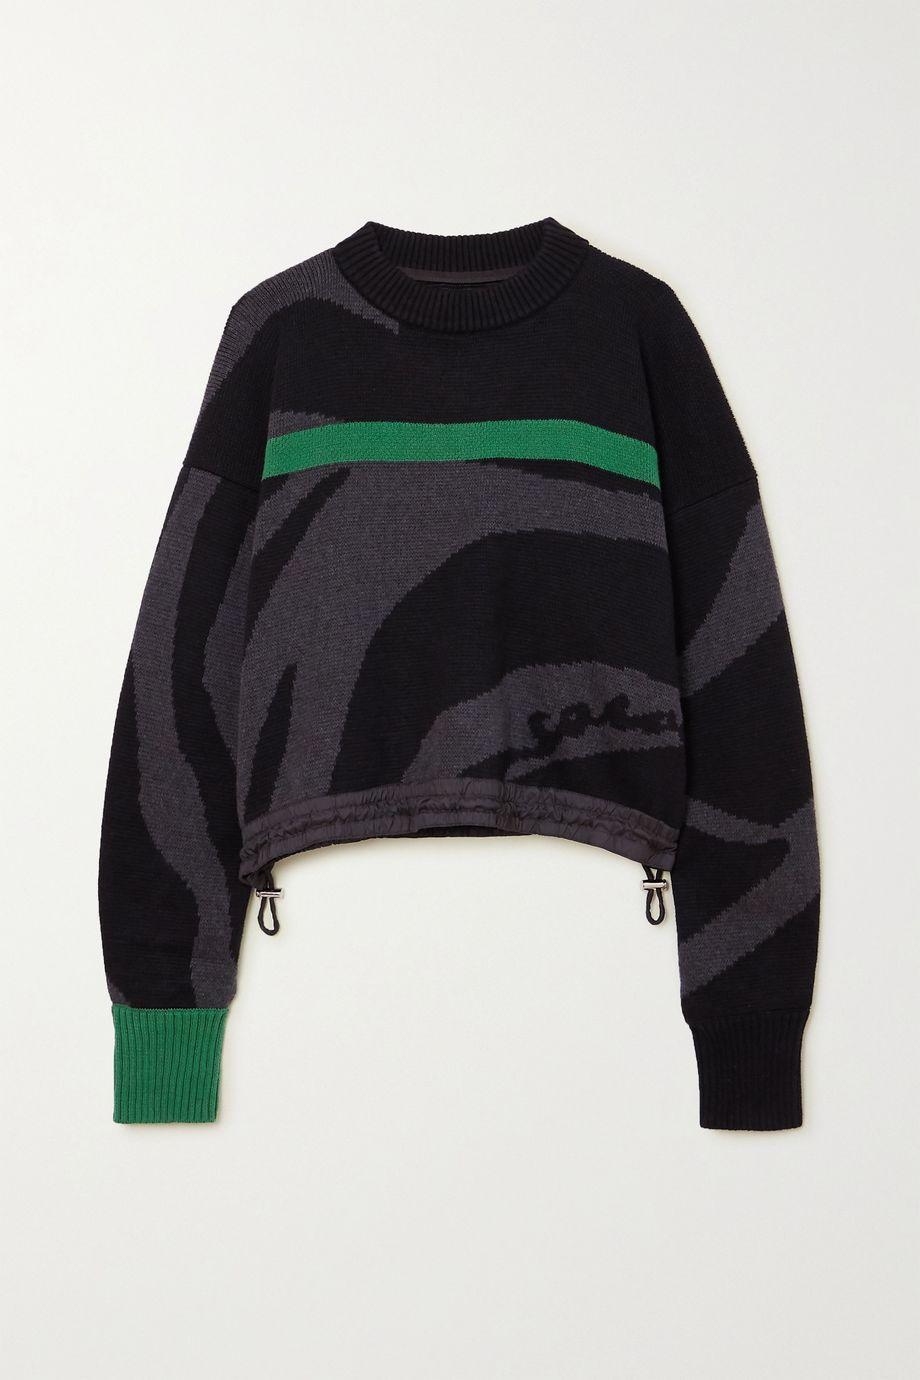 Sacai Cropped striped intarsia cotton sweater